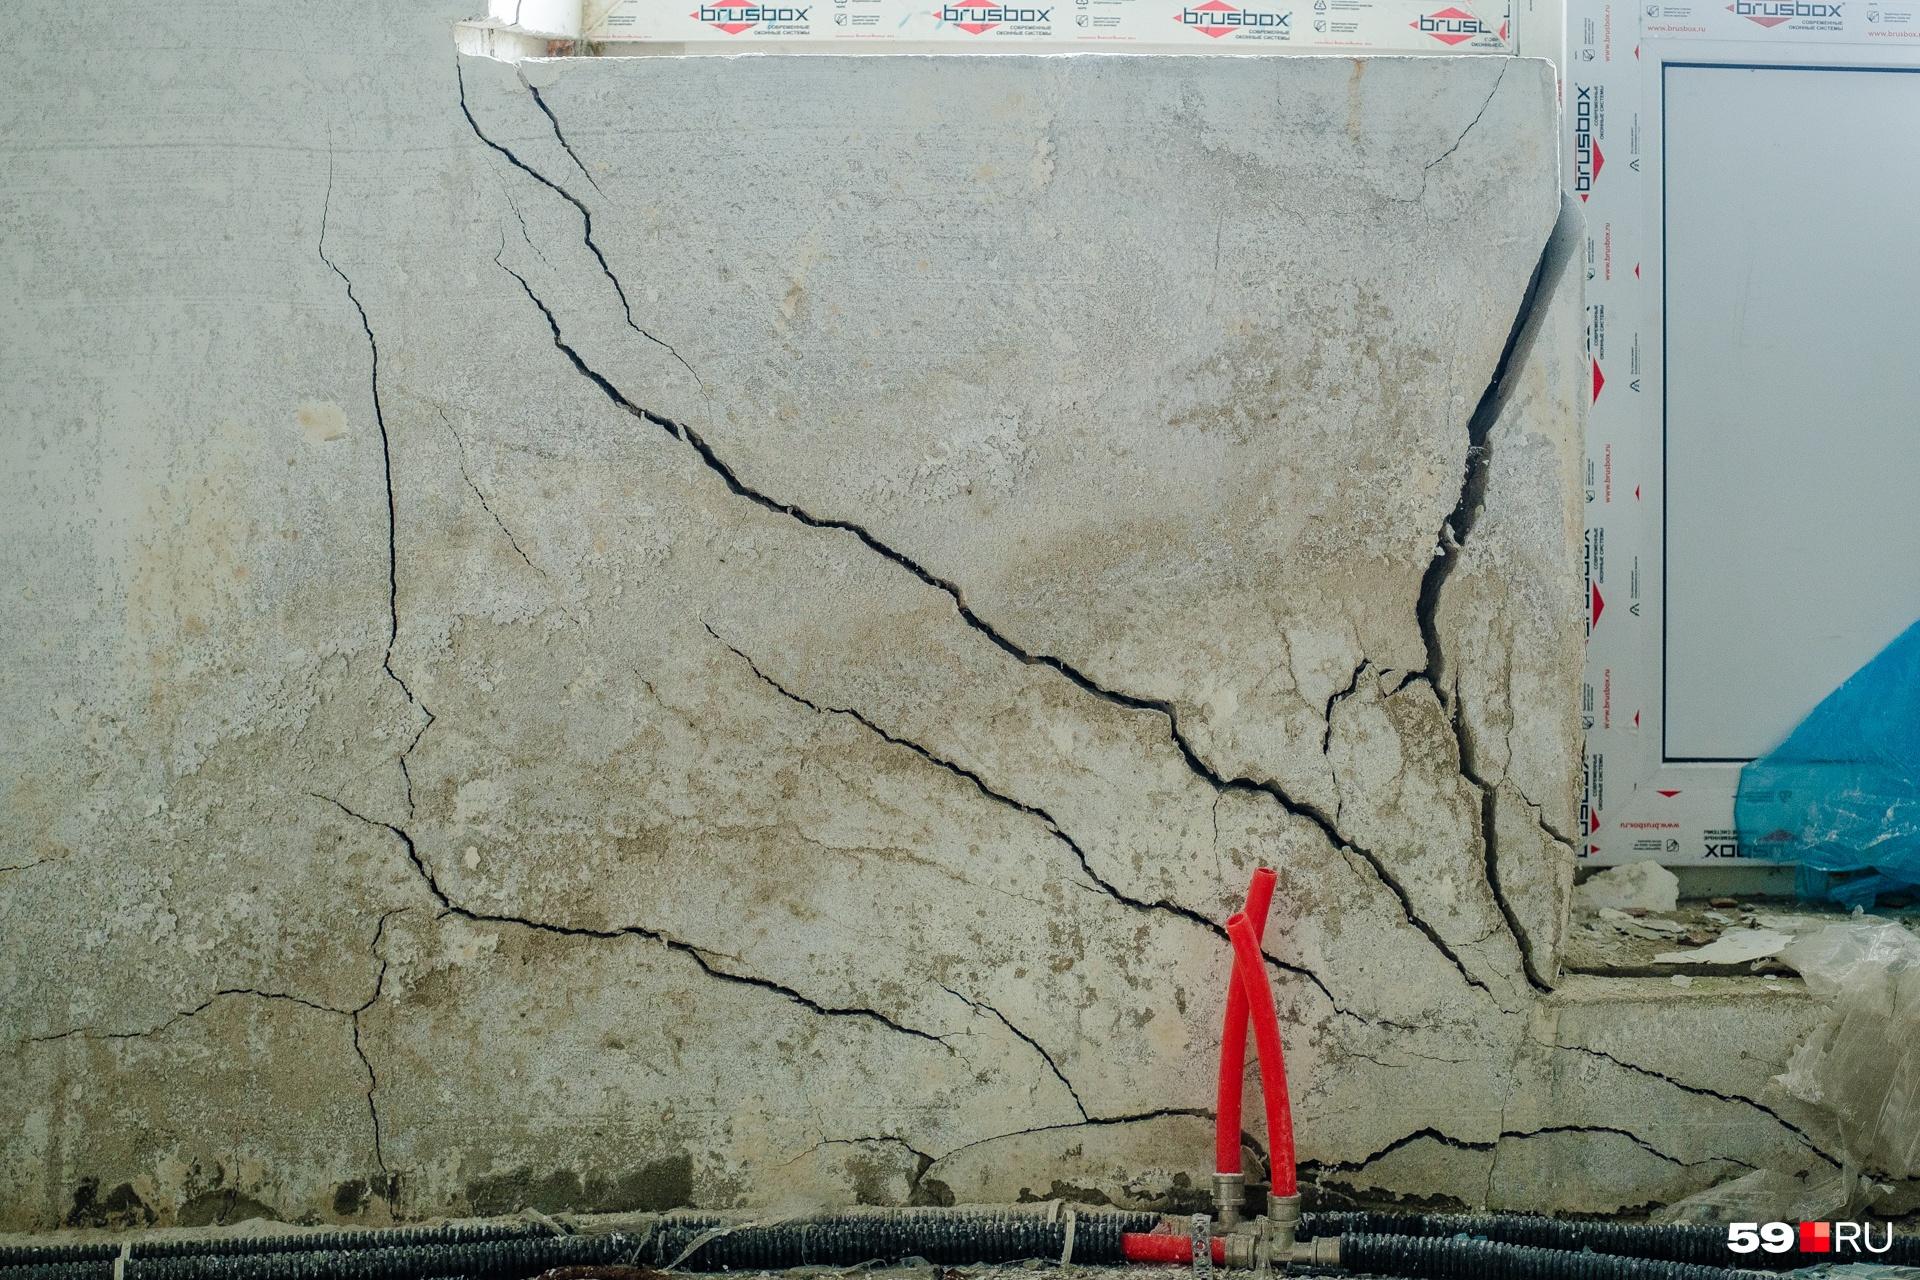 На стенах домов множество трещин